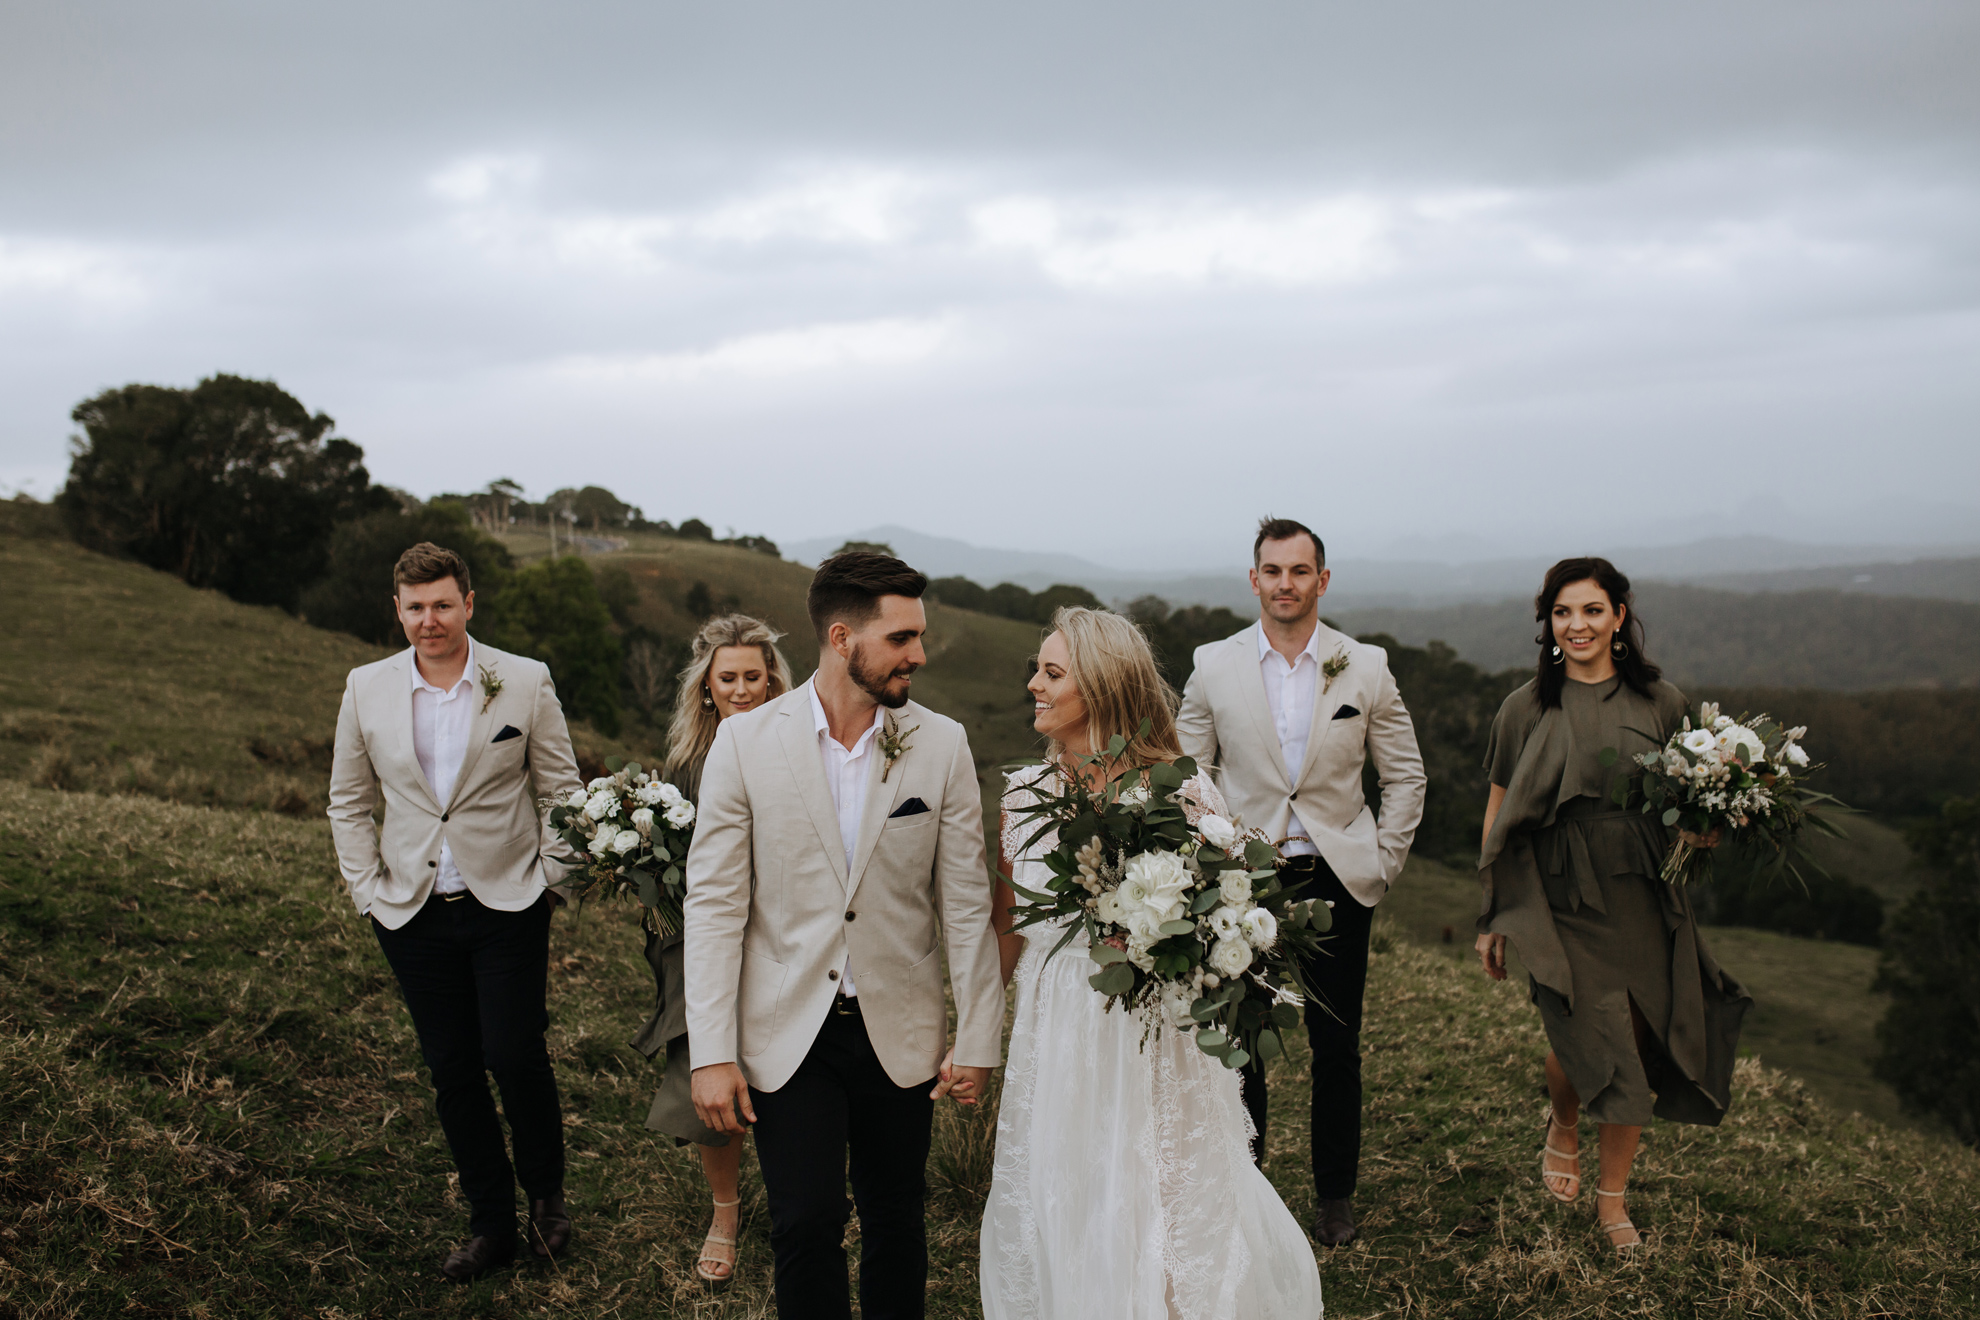 069-Kirby_Lewis_Maleny_Manor_Wedding.jpg